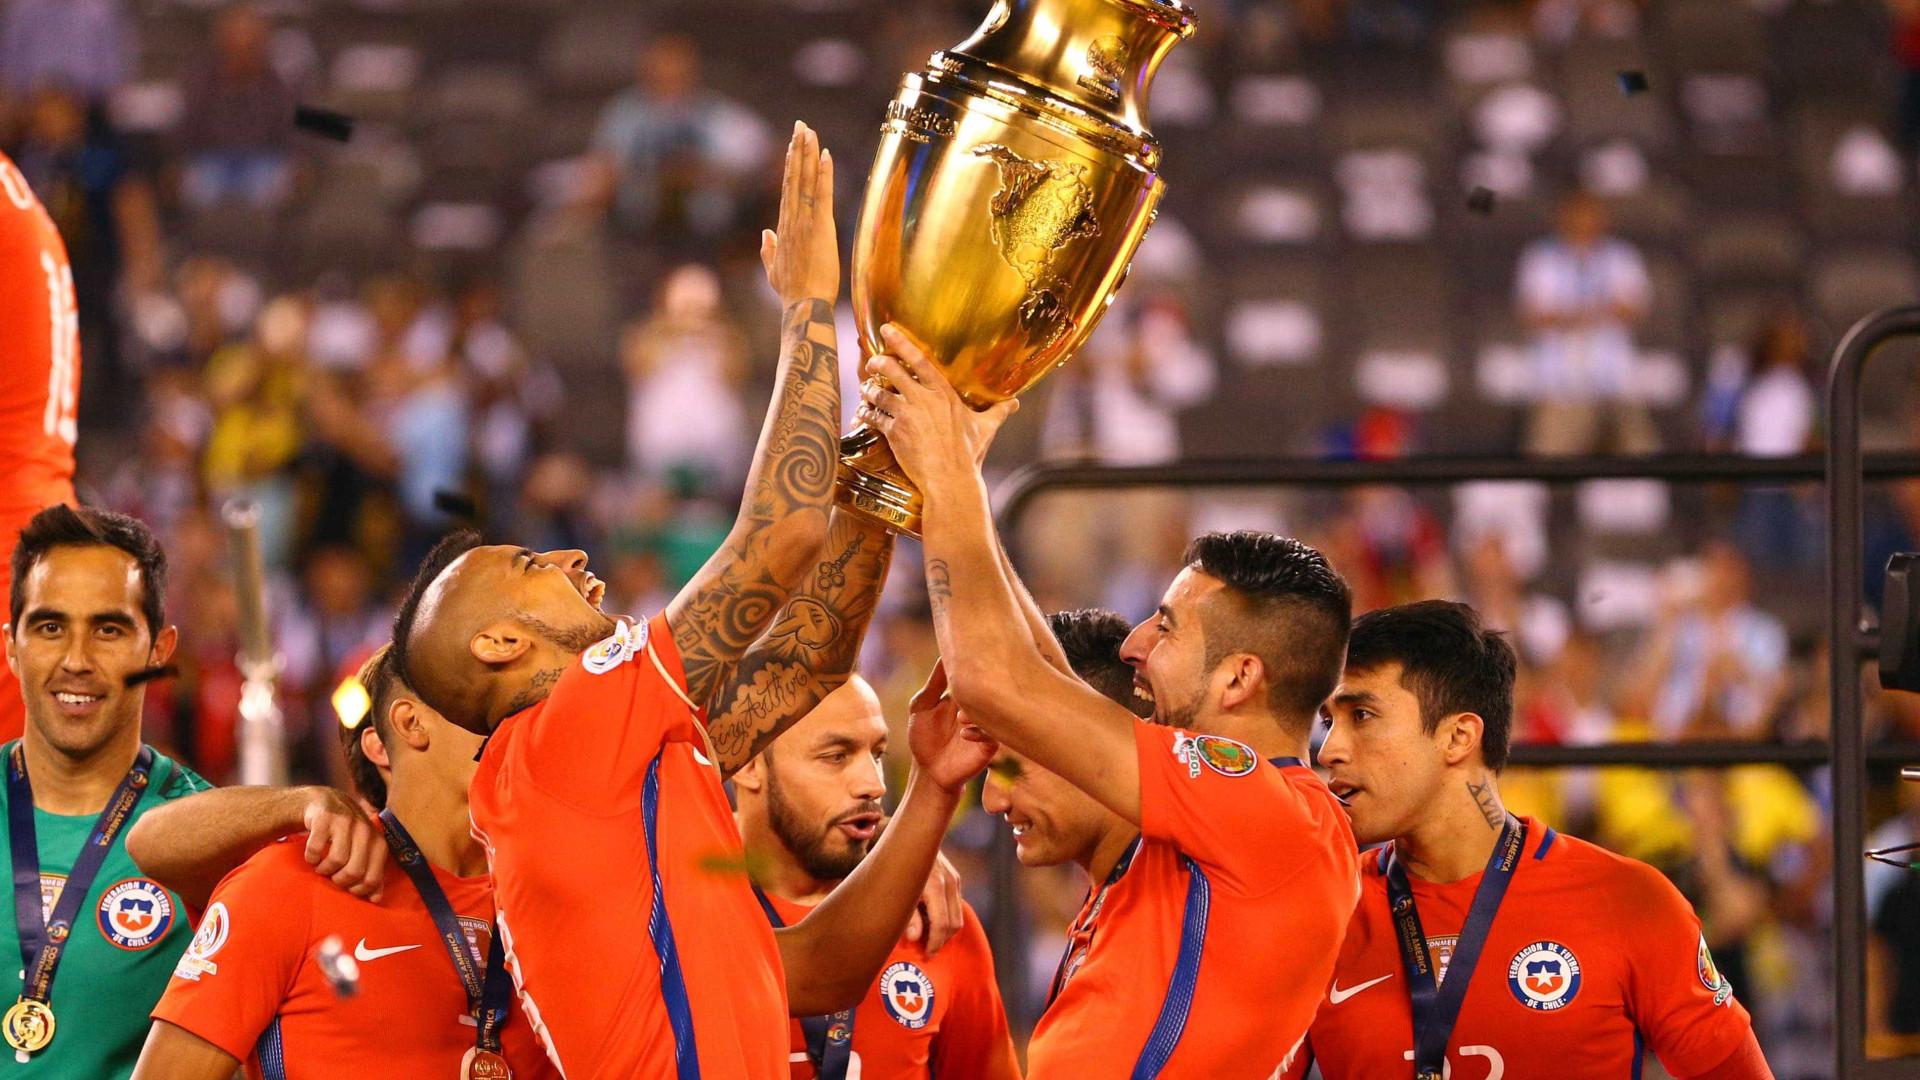 Na onda do sucesso do Chile, best-seller mistura  futebol e literatura